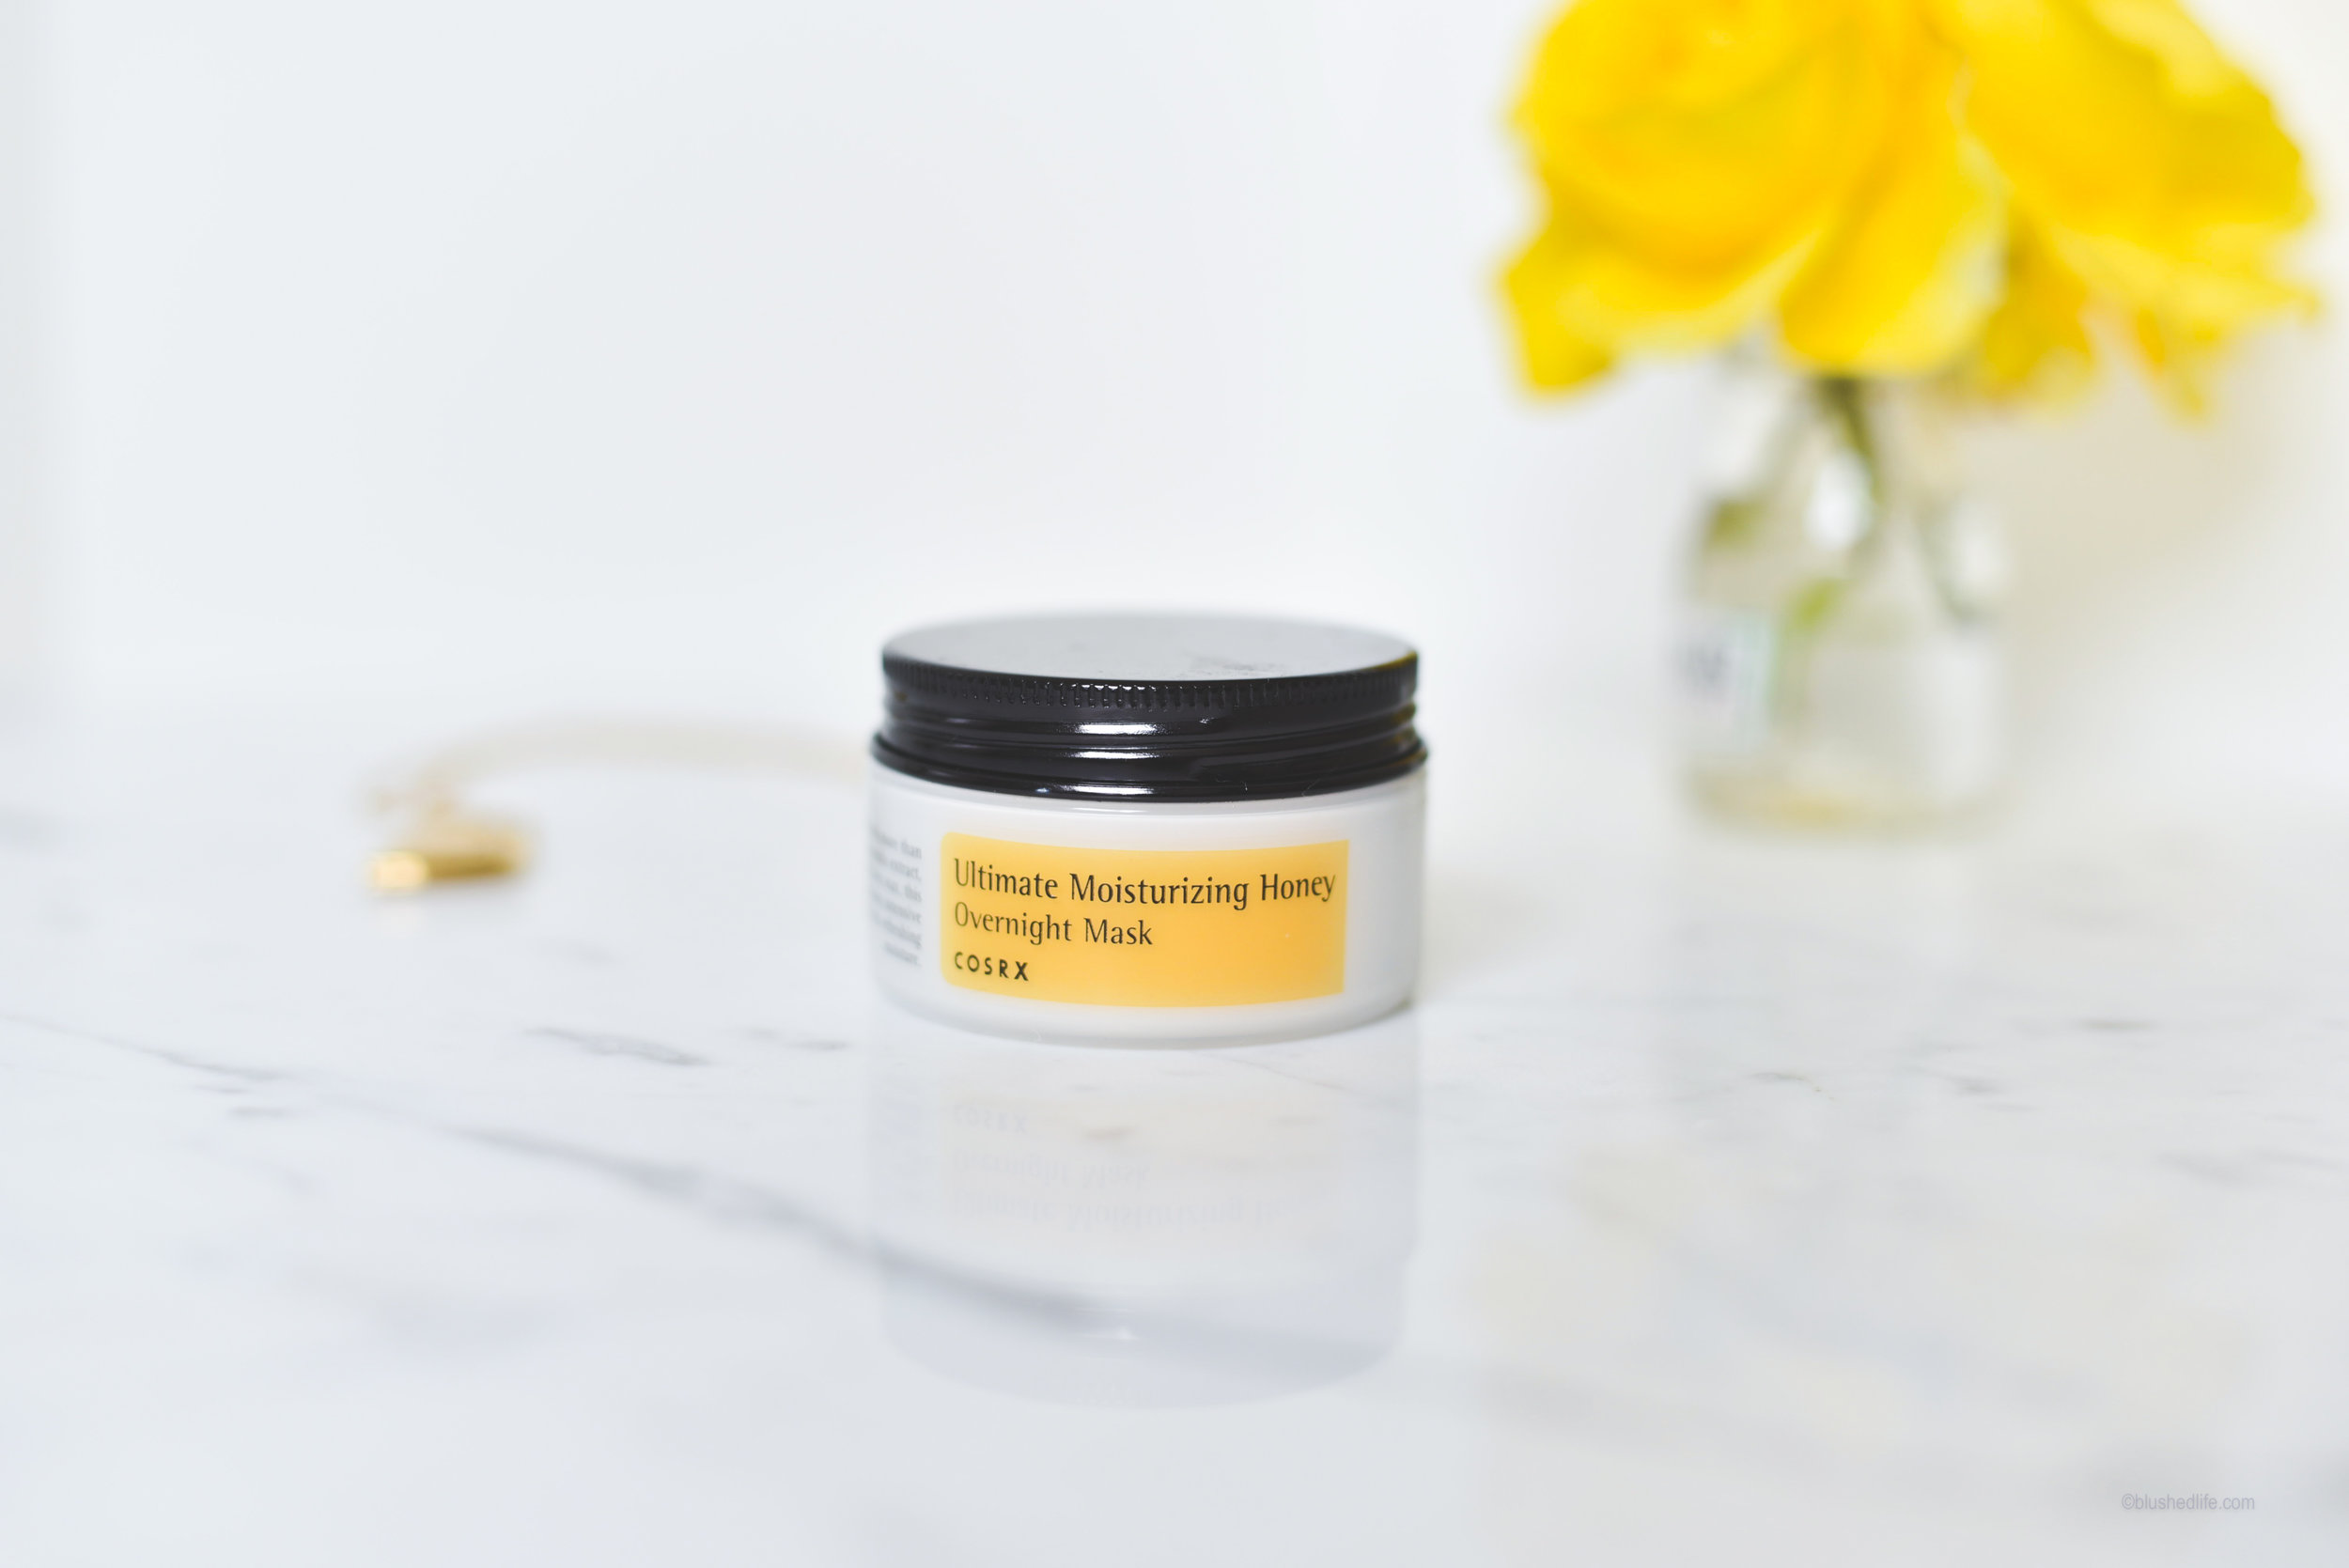 COSRX ultimate moisturizing honey overnight mask review_DSC_4872-2.jpg